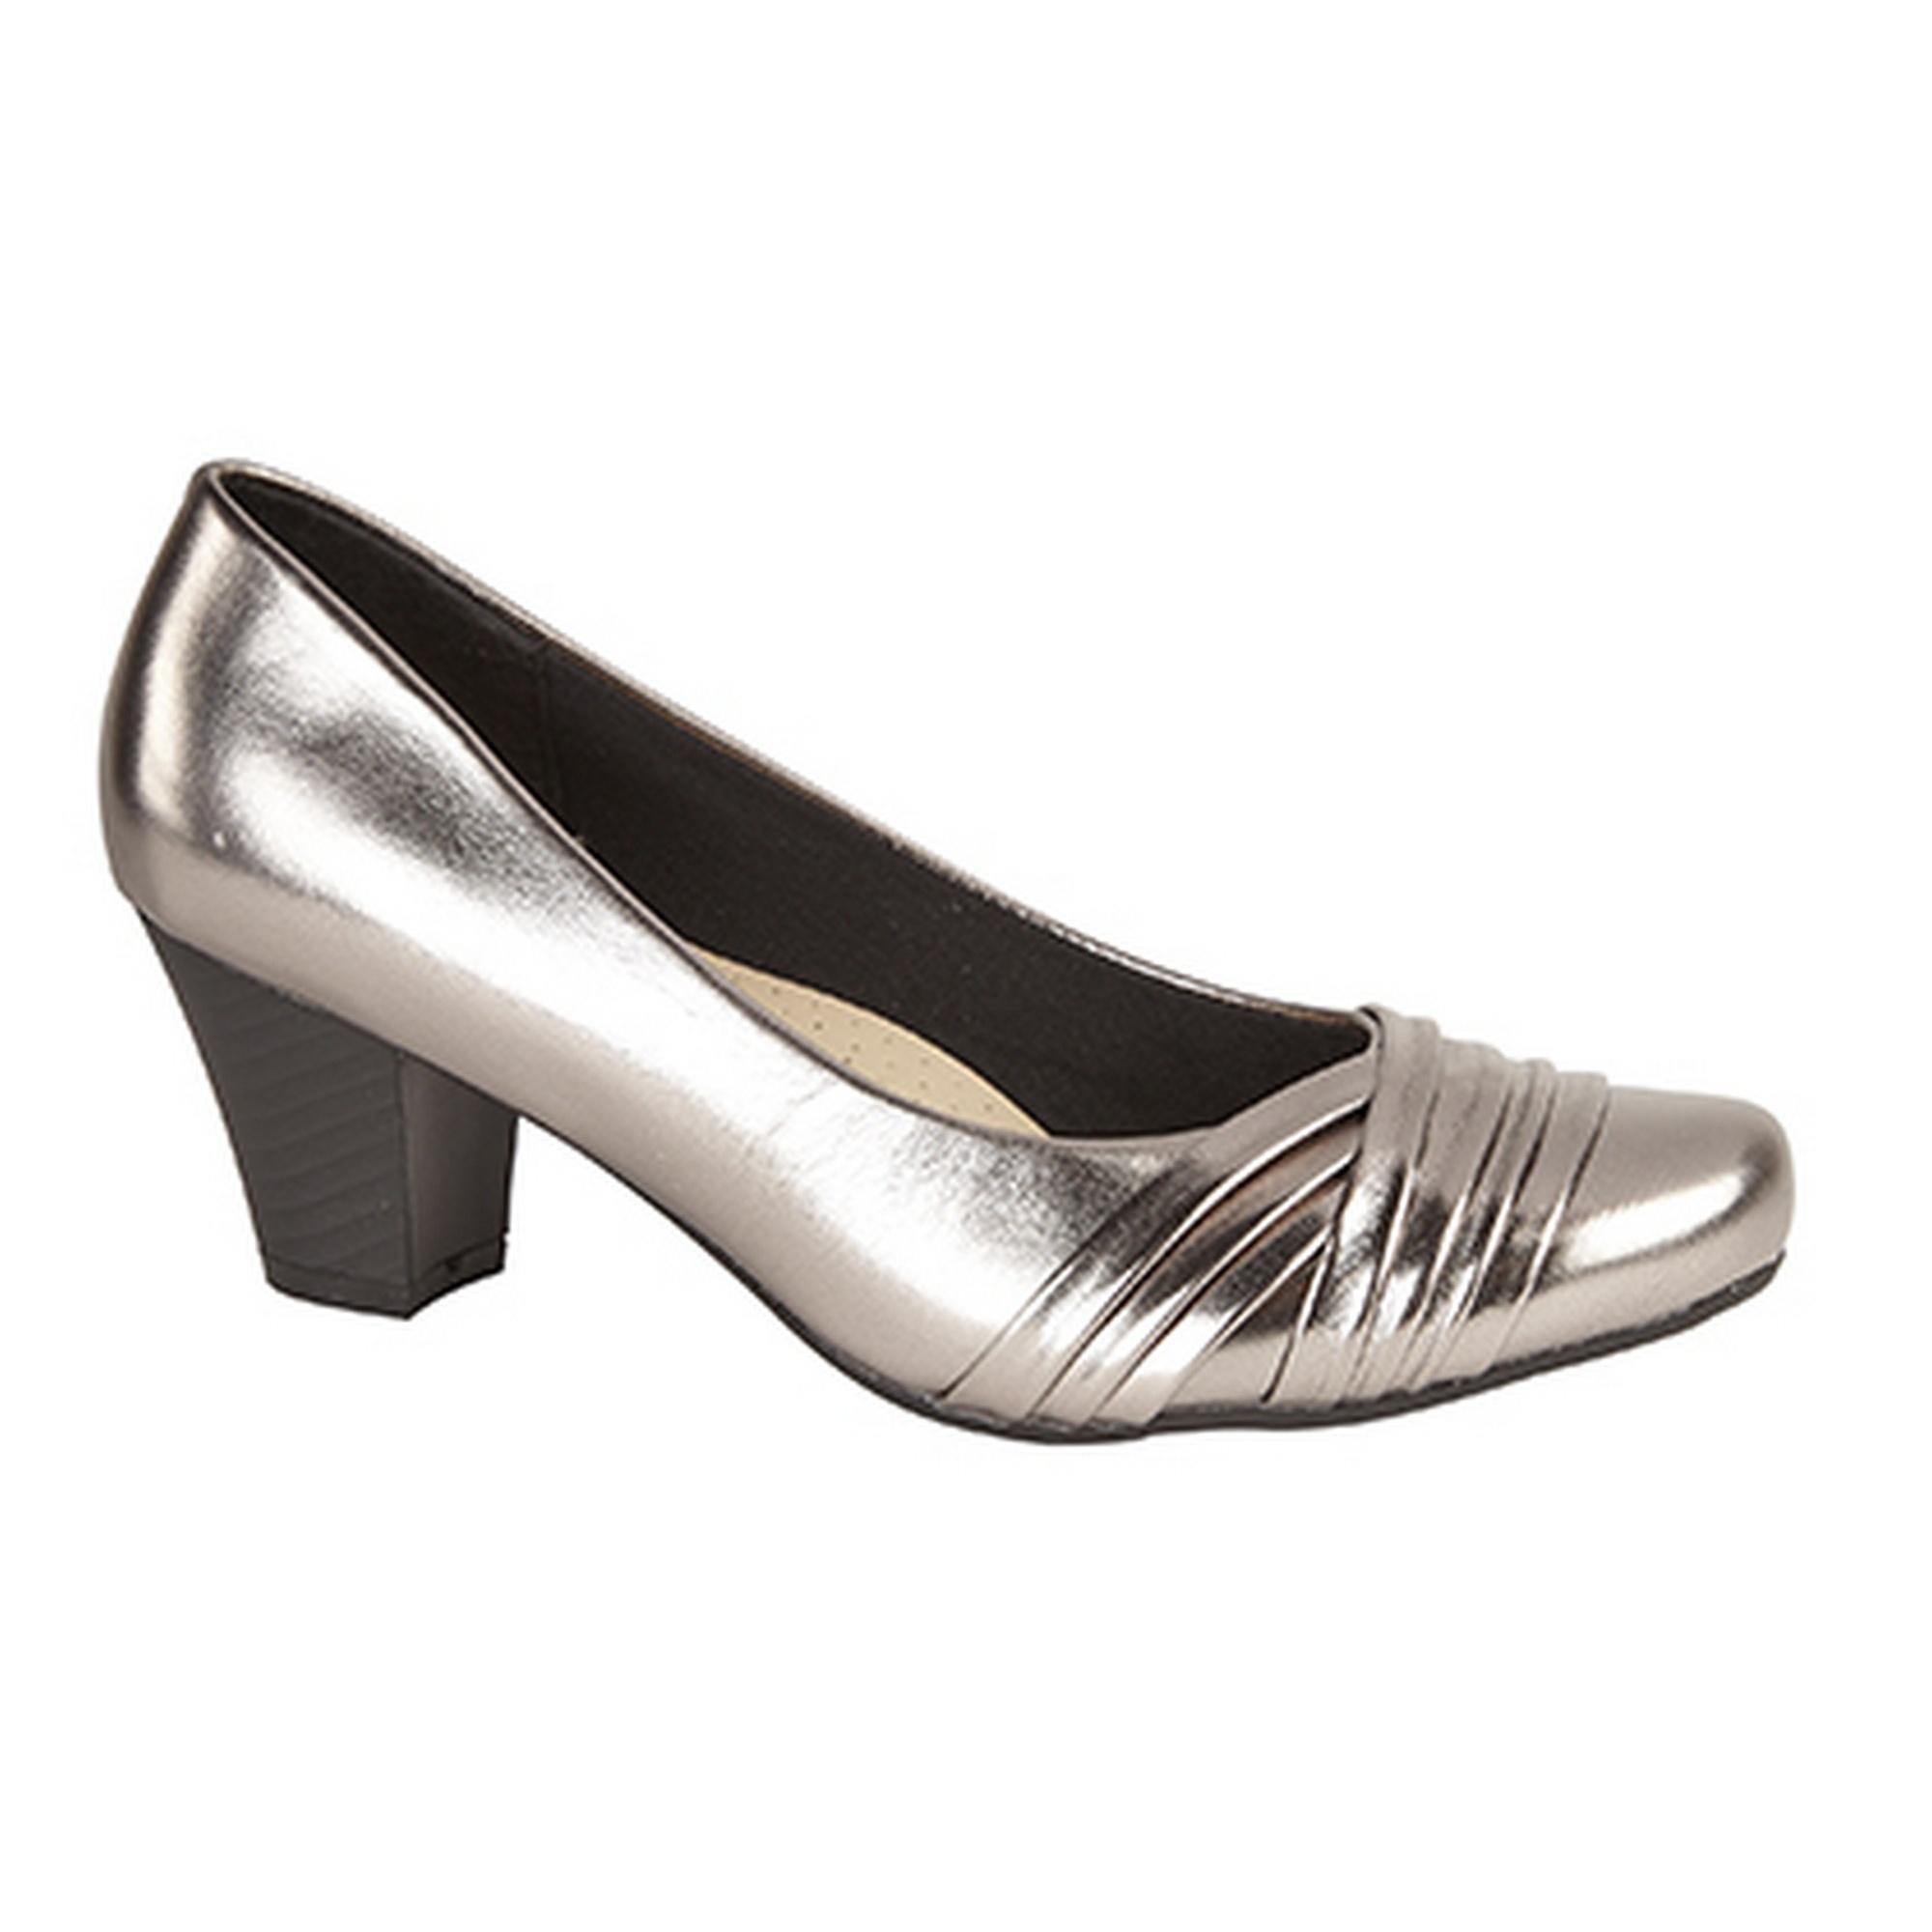 Comfort Womens Shoes Australia